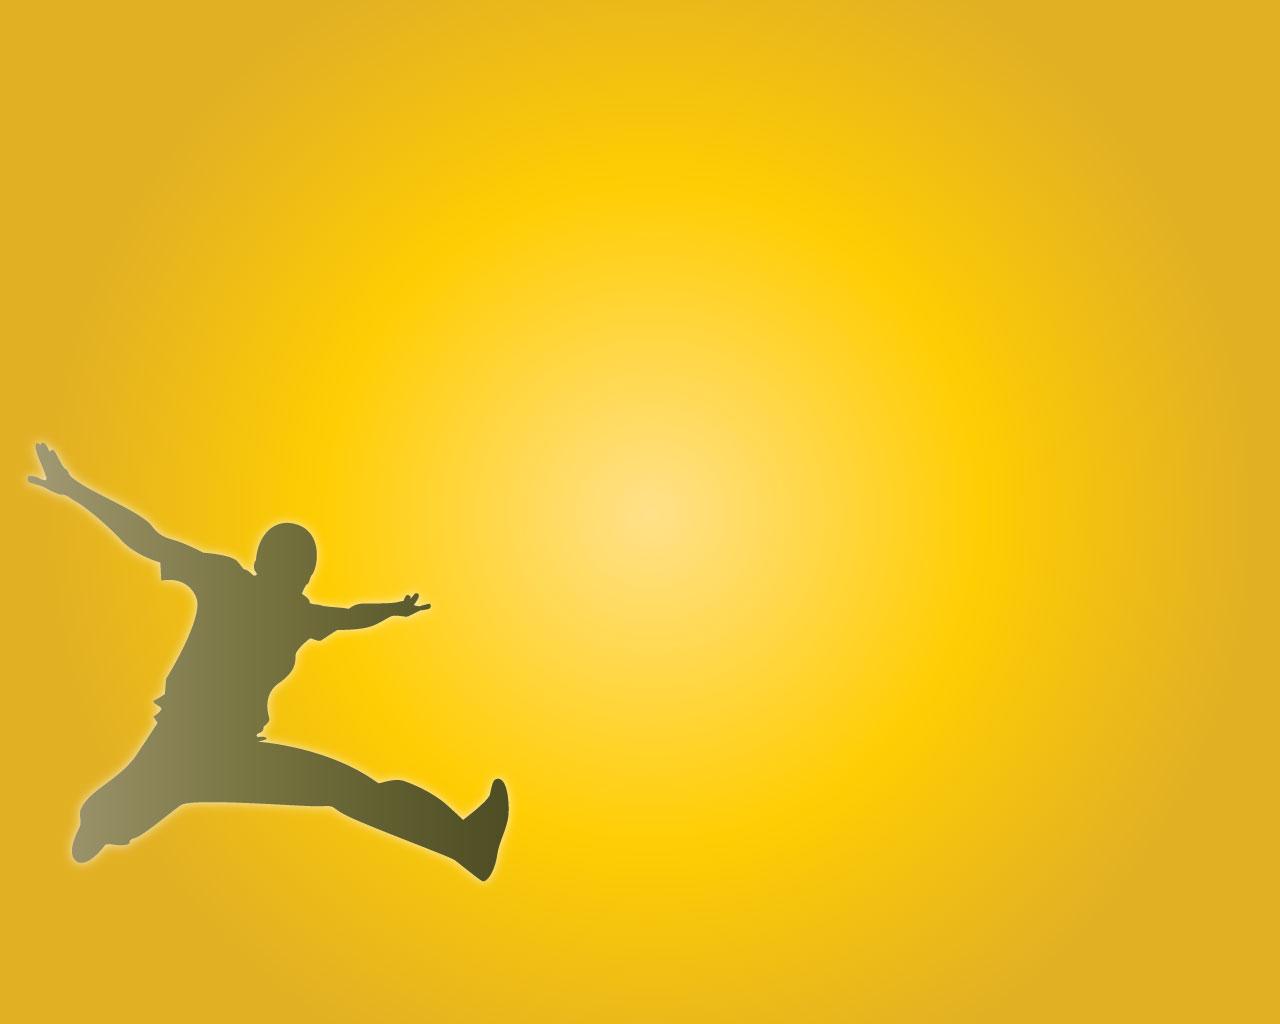 Unduh 77 Background Power Point Tentang Olahraga Gratis